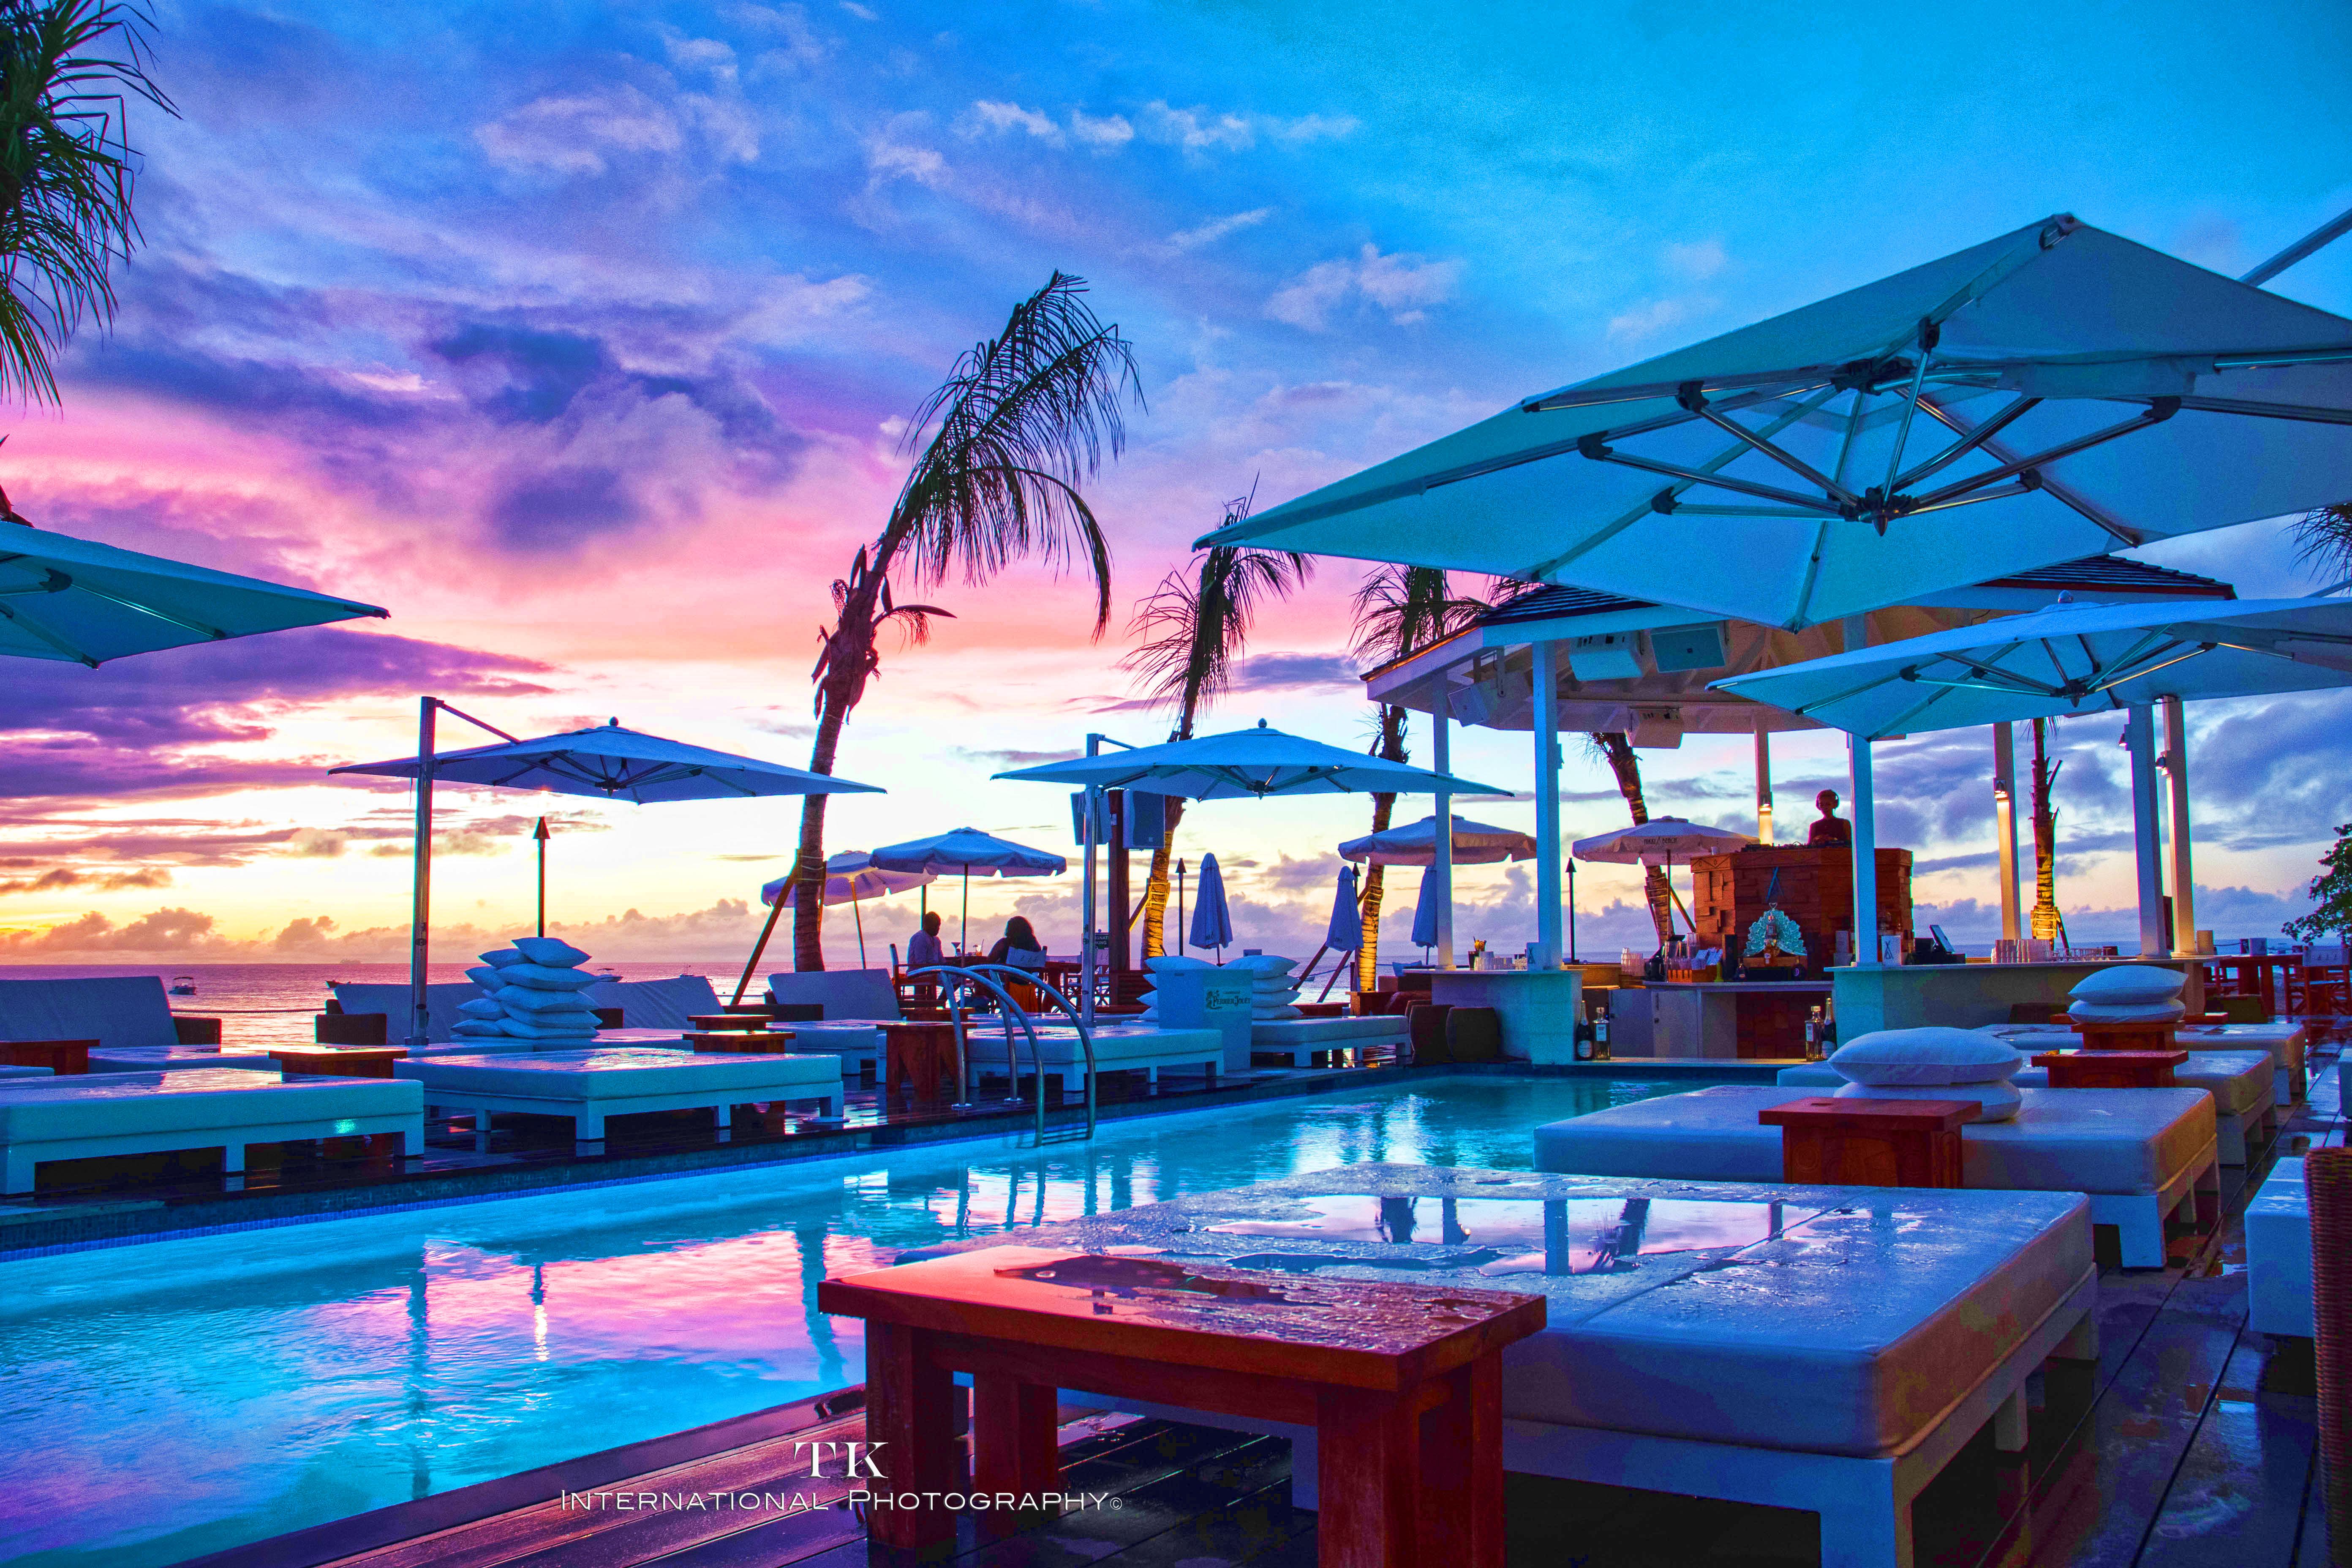 Nikki Beach Barbados-pool-sunset-luxury-beautiful-Caribbean